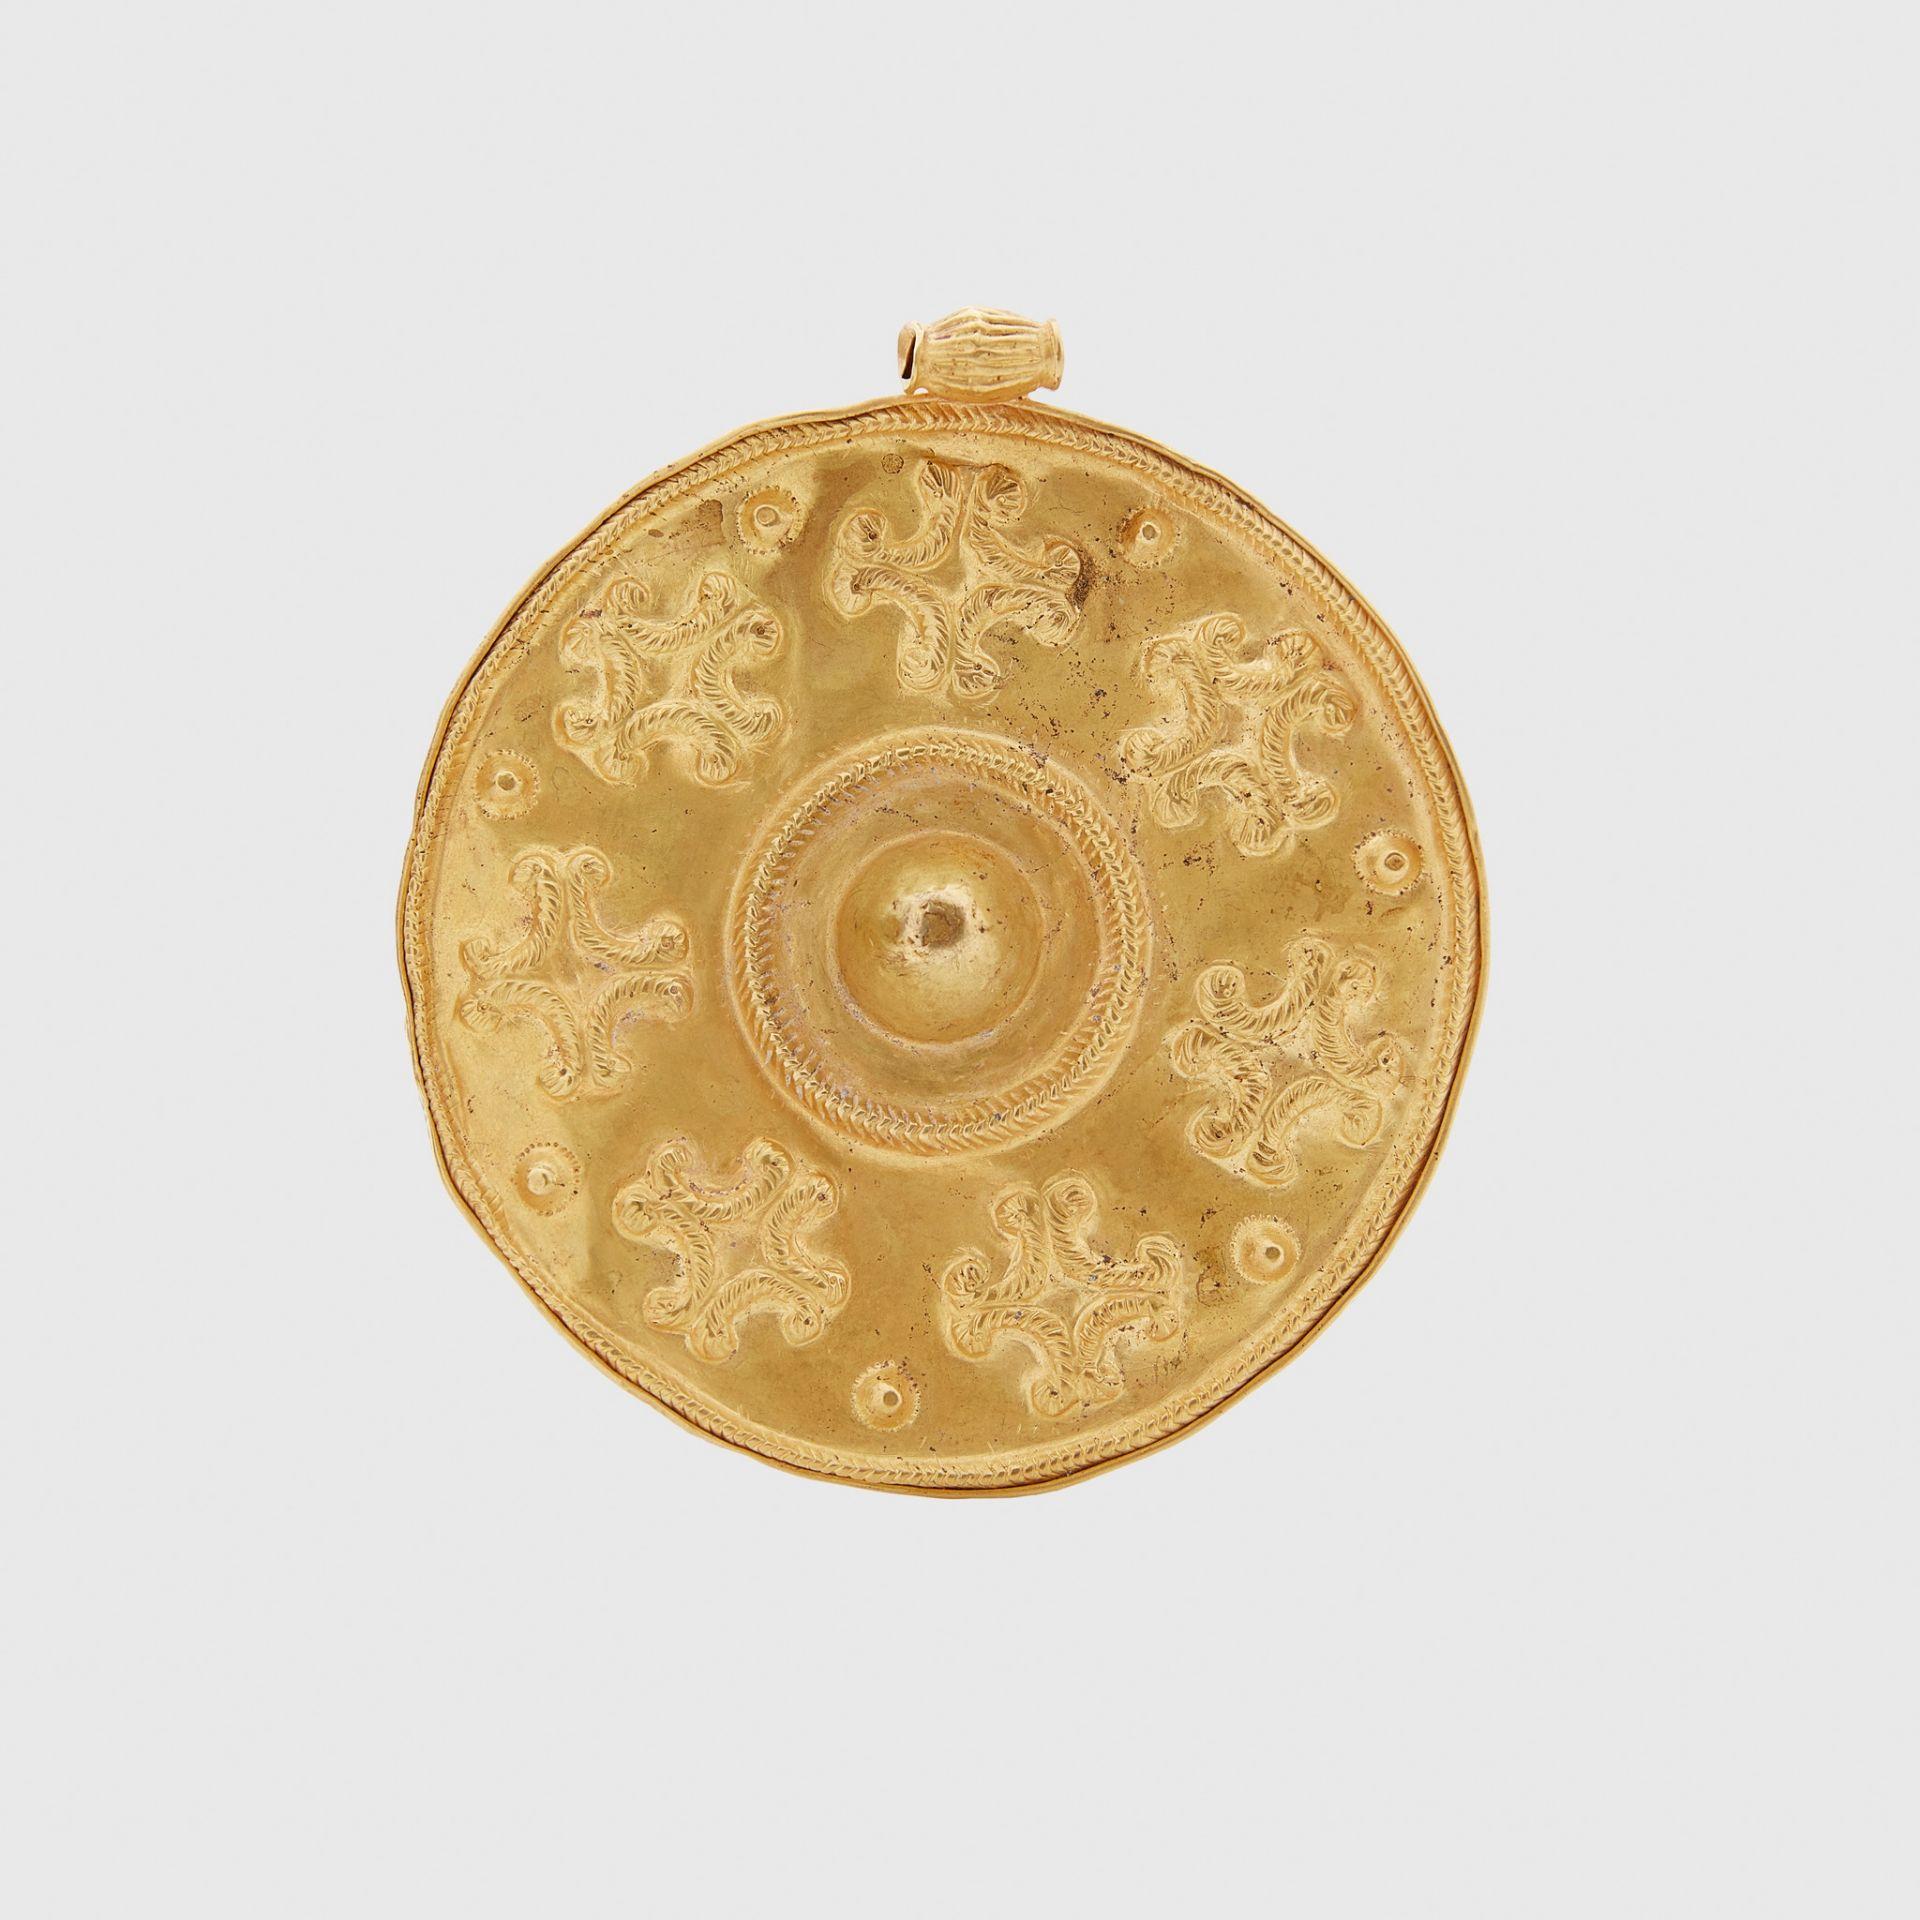 HELLENISTIC GOLD DISK PENDANT EASTERN MEDITERRANEAN, 1ST CENTURY A.D.